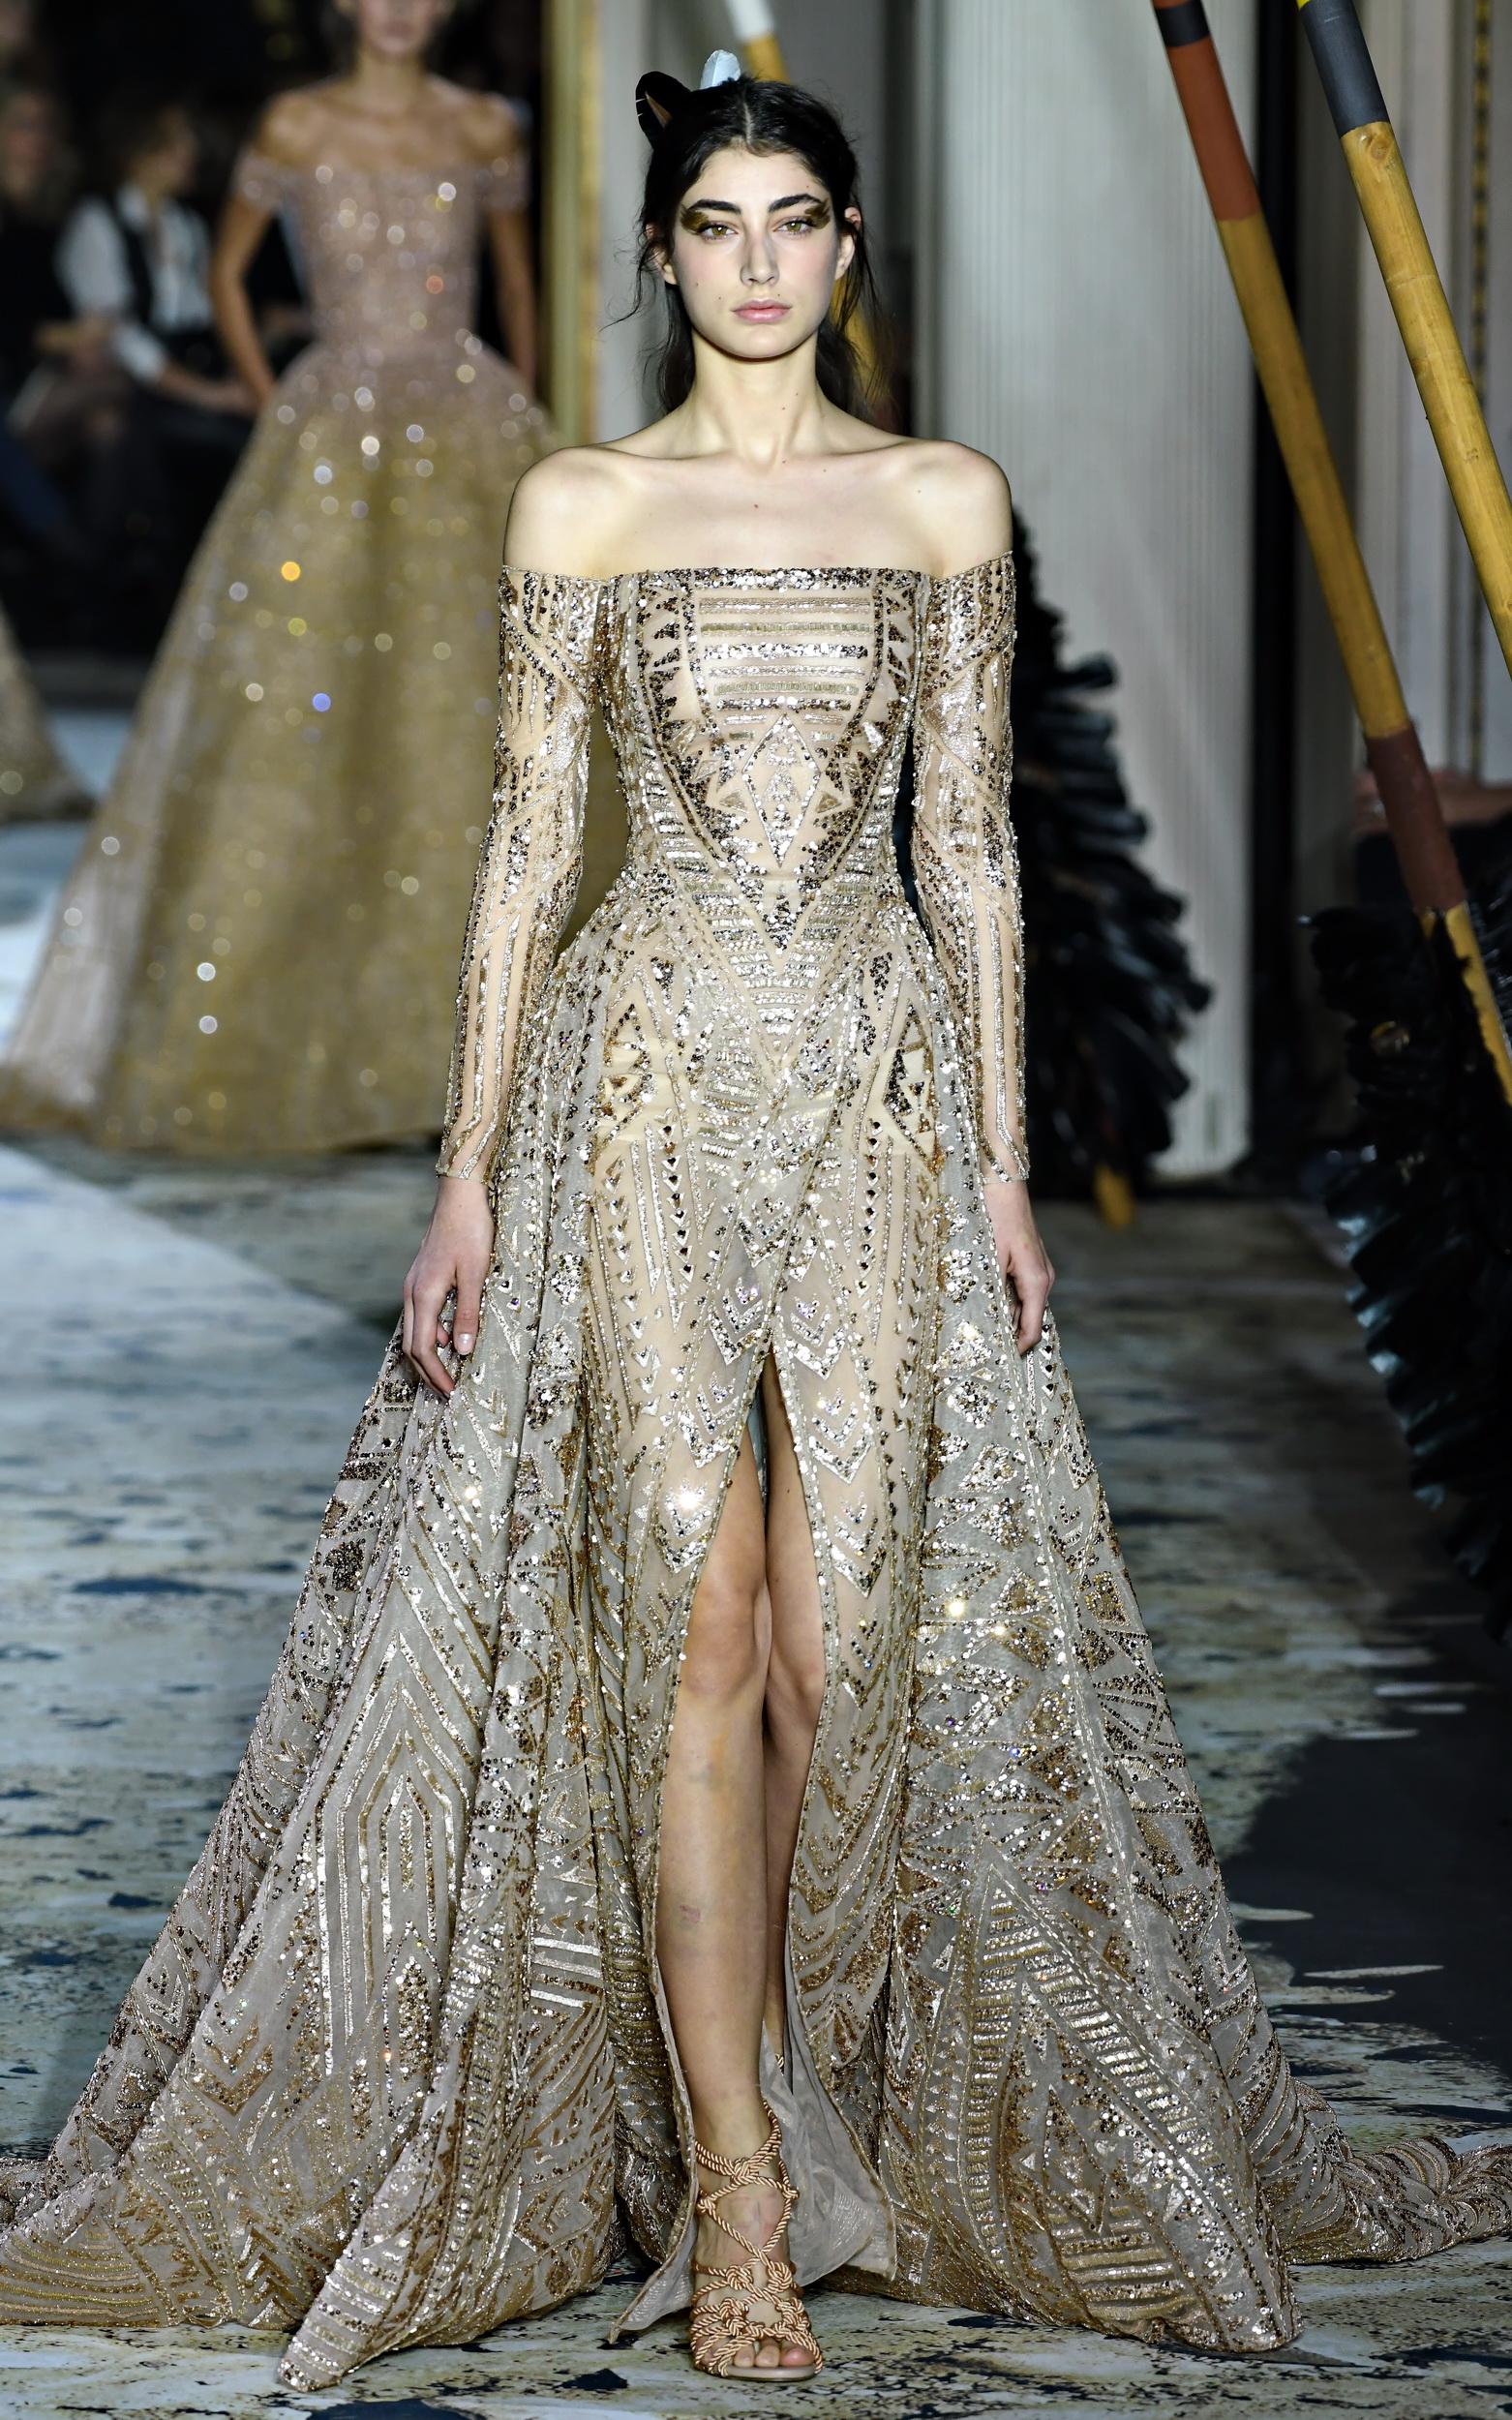 Paris Haute Couture SS 2018 Zuhair Murad 4to4u Arthur Koff 17.JPG